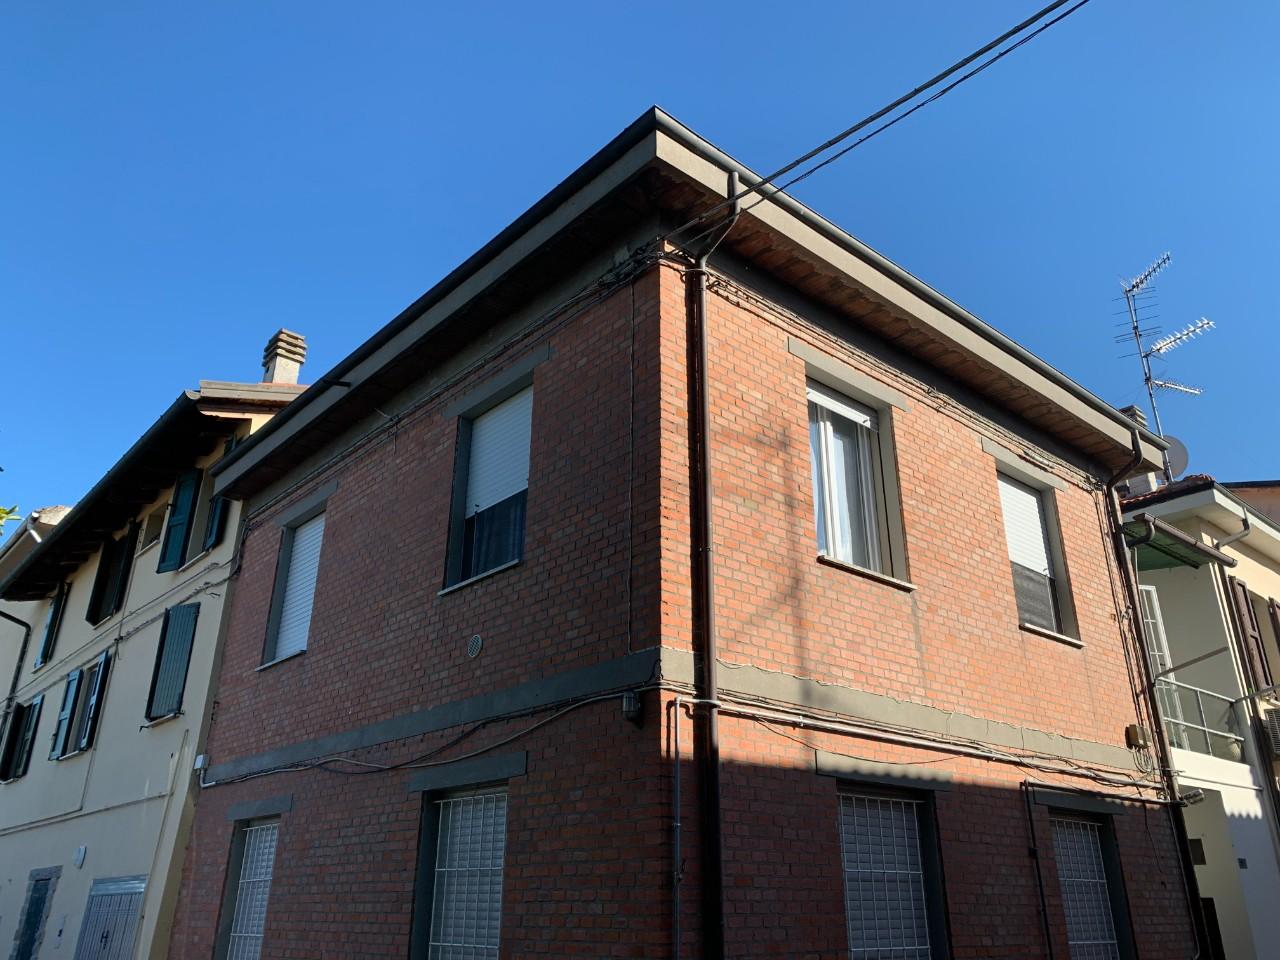 Bilocale in vendita Castel San Pietro